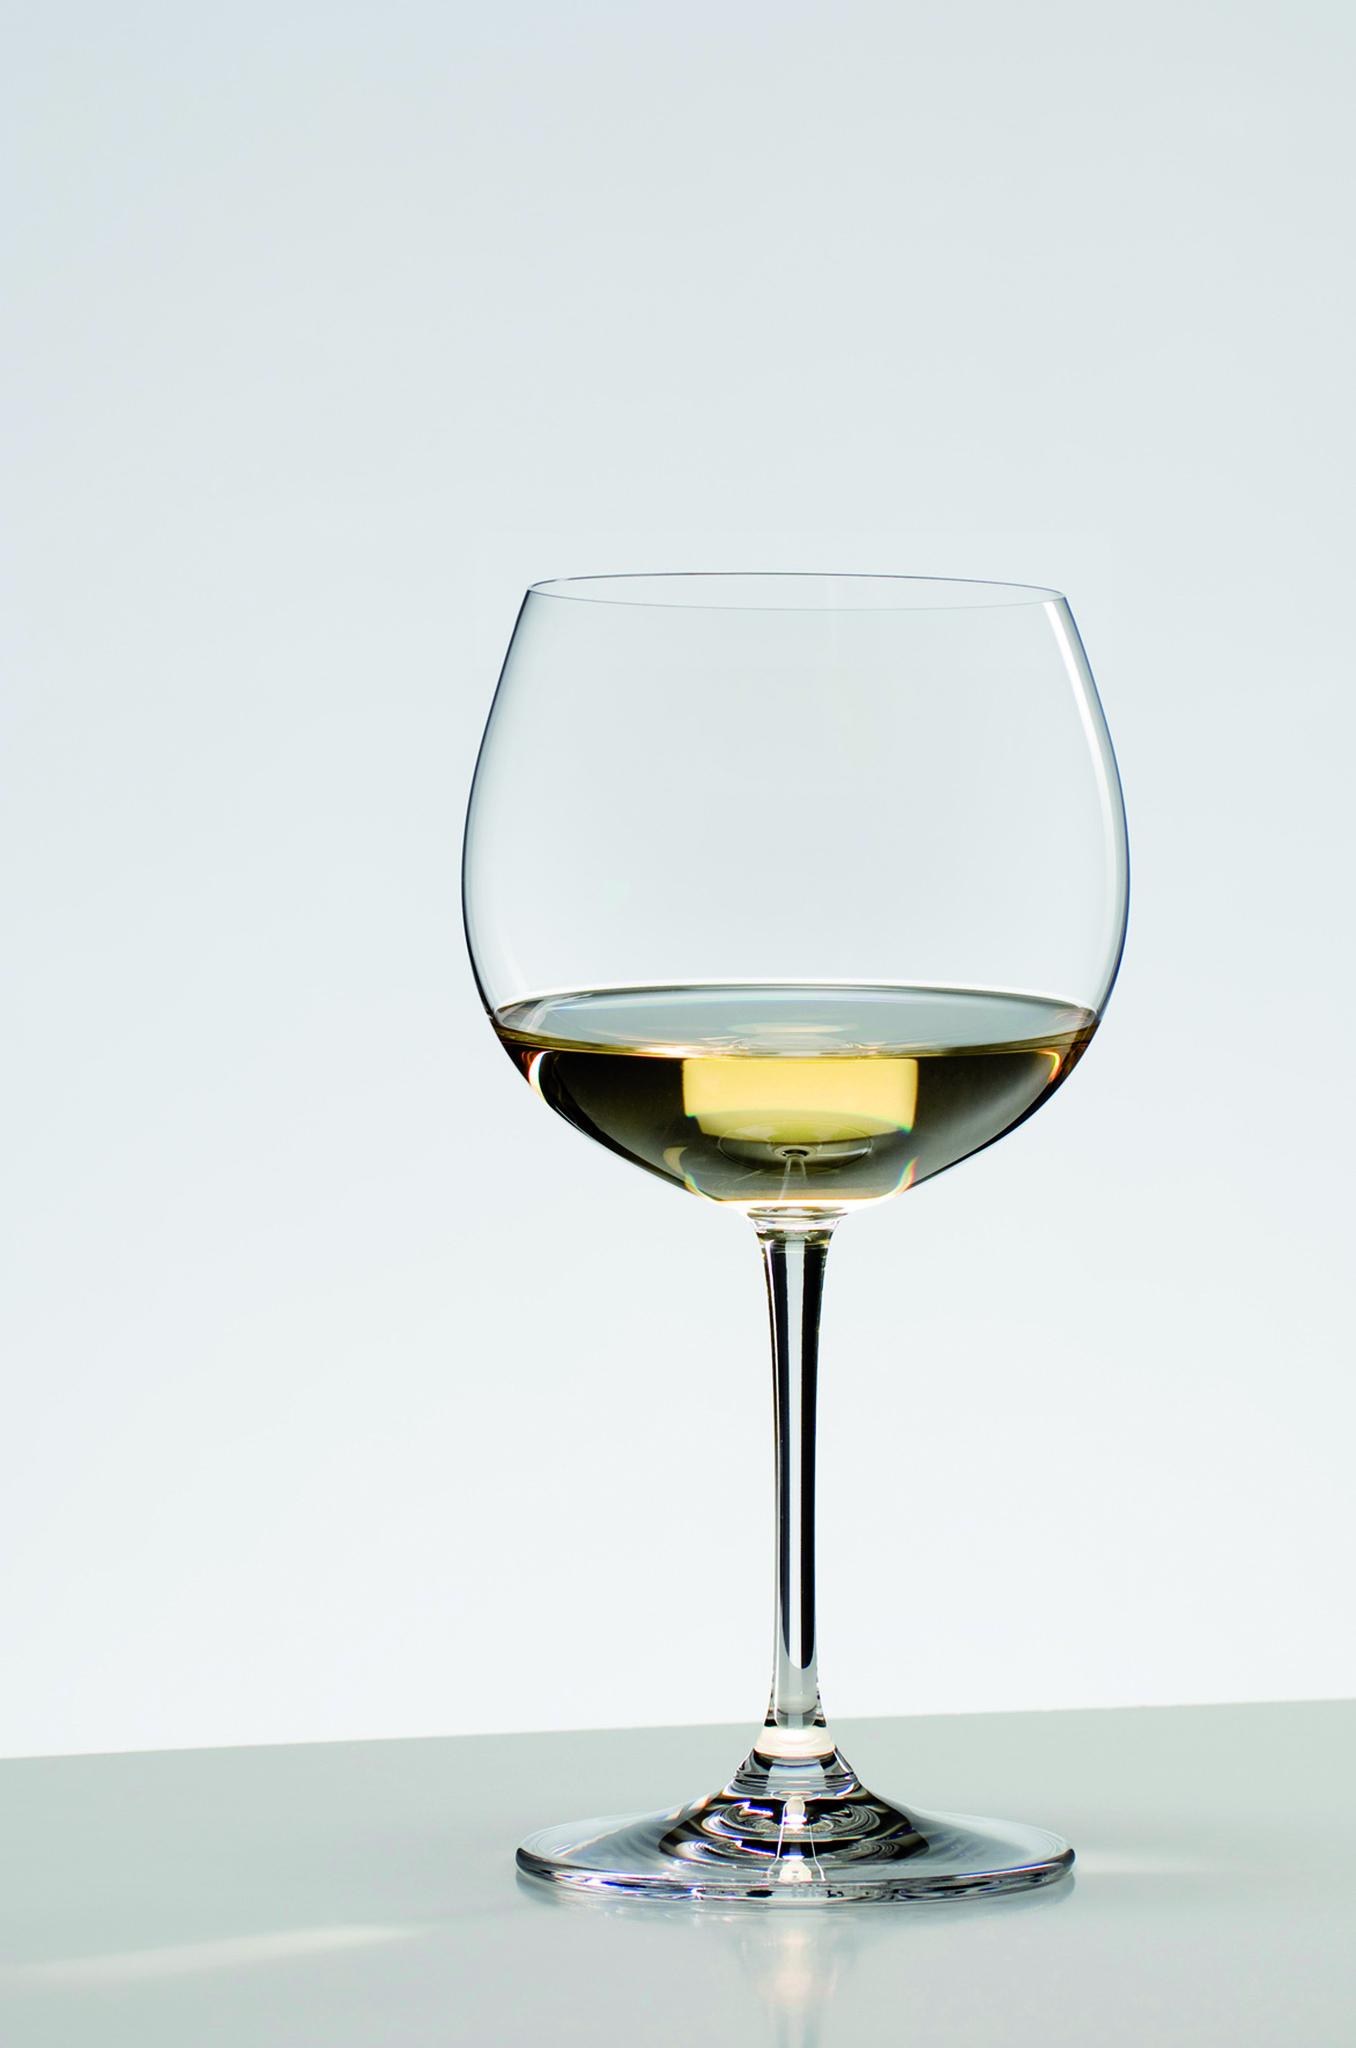 Бокалы Набор бокалов для белого вина 2шт 552мл Riedel Vinum XL Montrachet (Chardonnay) nabor-bokalov-dlya-belogo-vina-2-sht-552-ml-riedel-vinum-xl-montrachet-chardonnay-avstriya.jpg